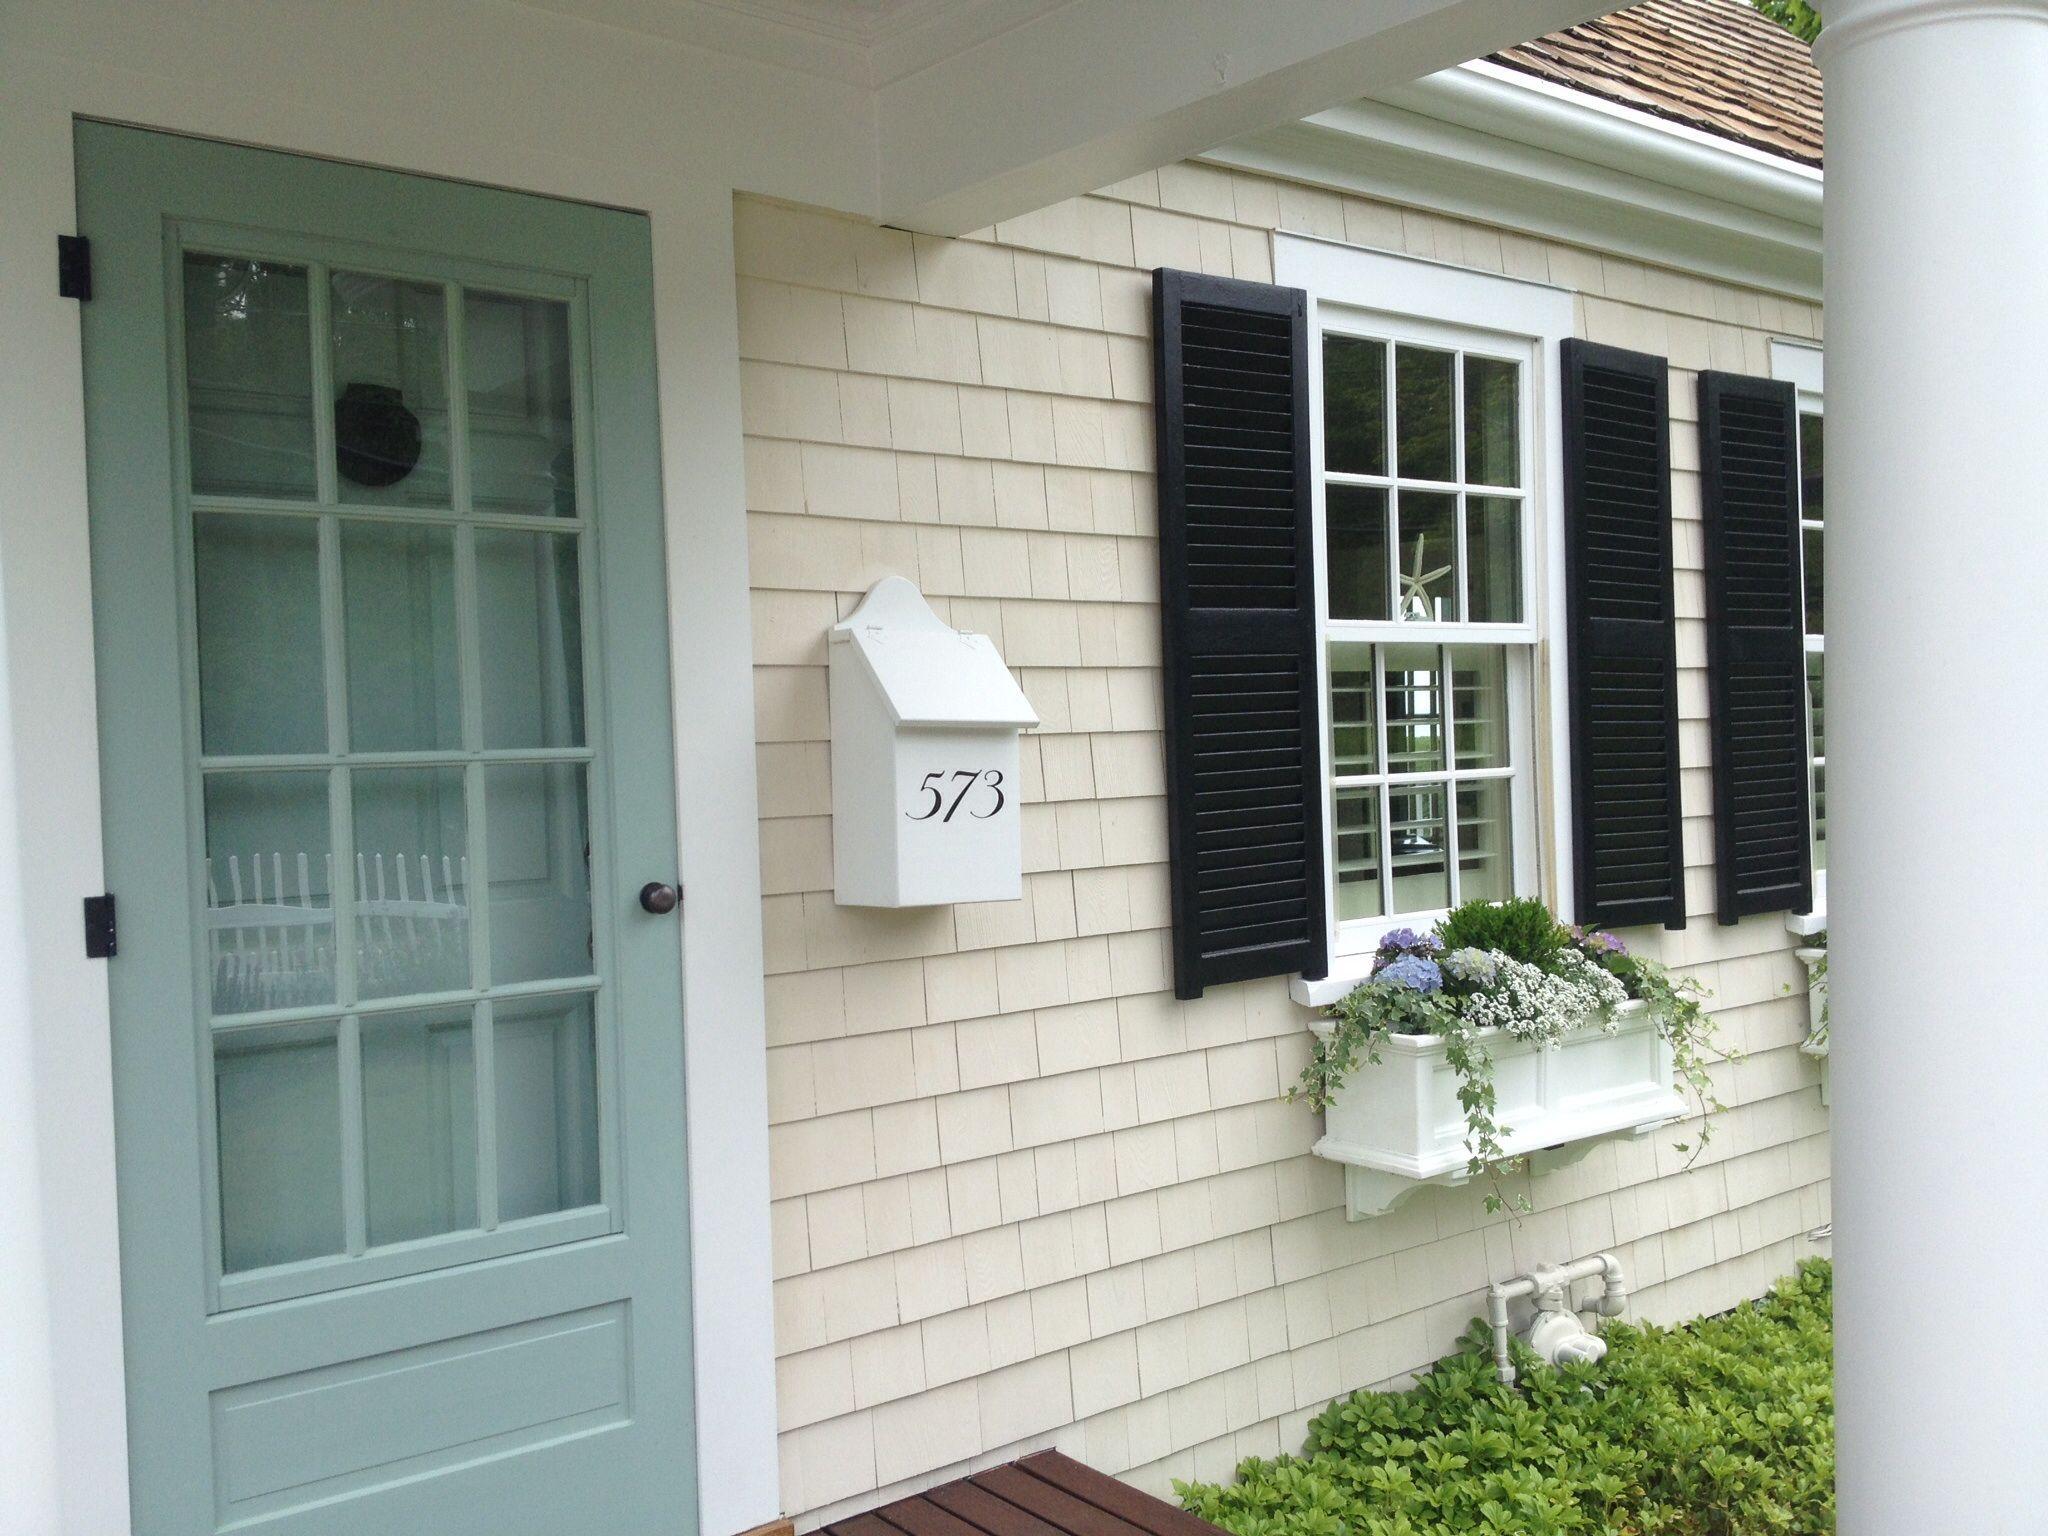 Painted house in benjamin moore arborcoat semi solid stain for Exterior door colors benjamin moore